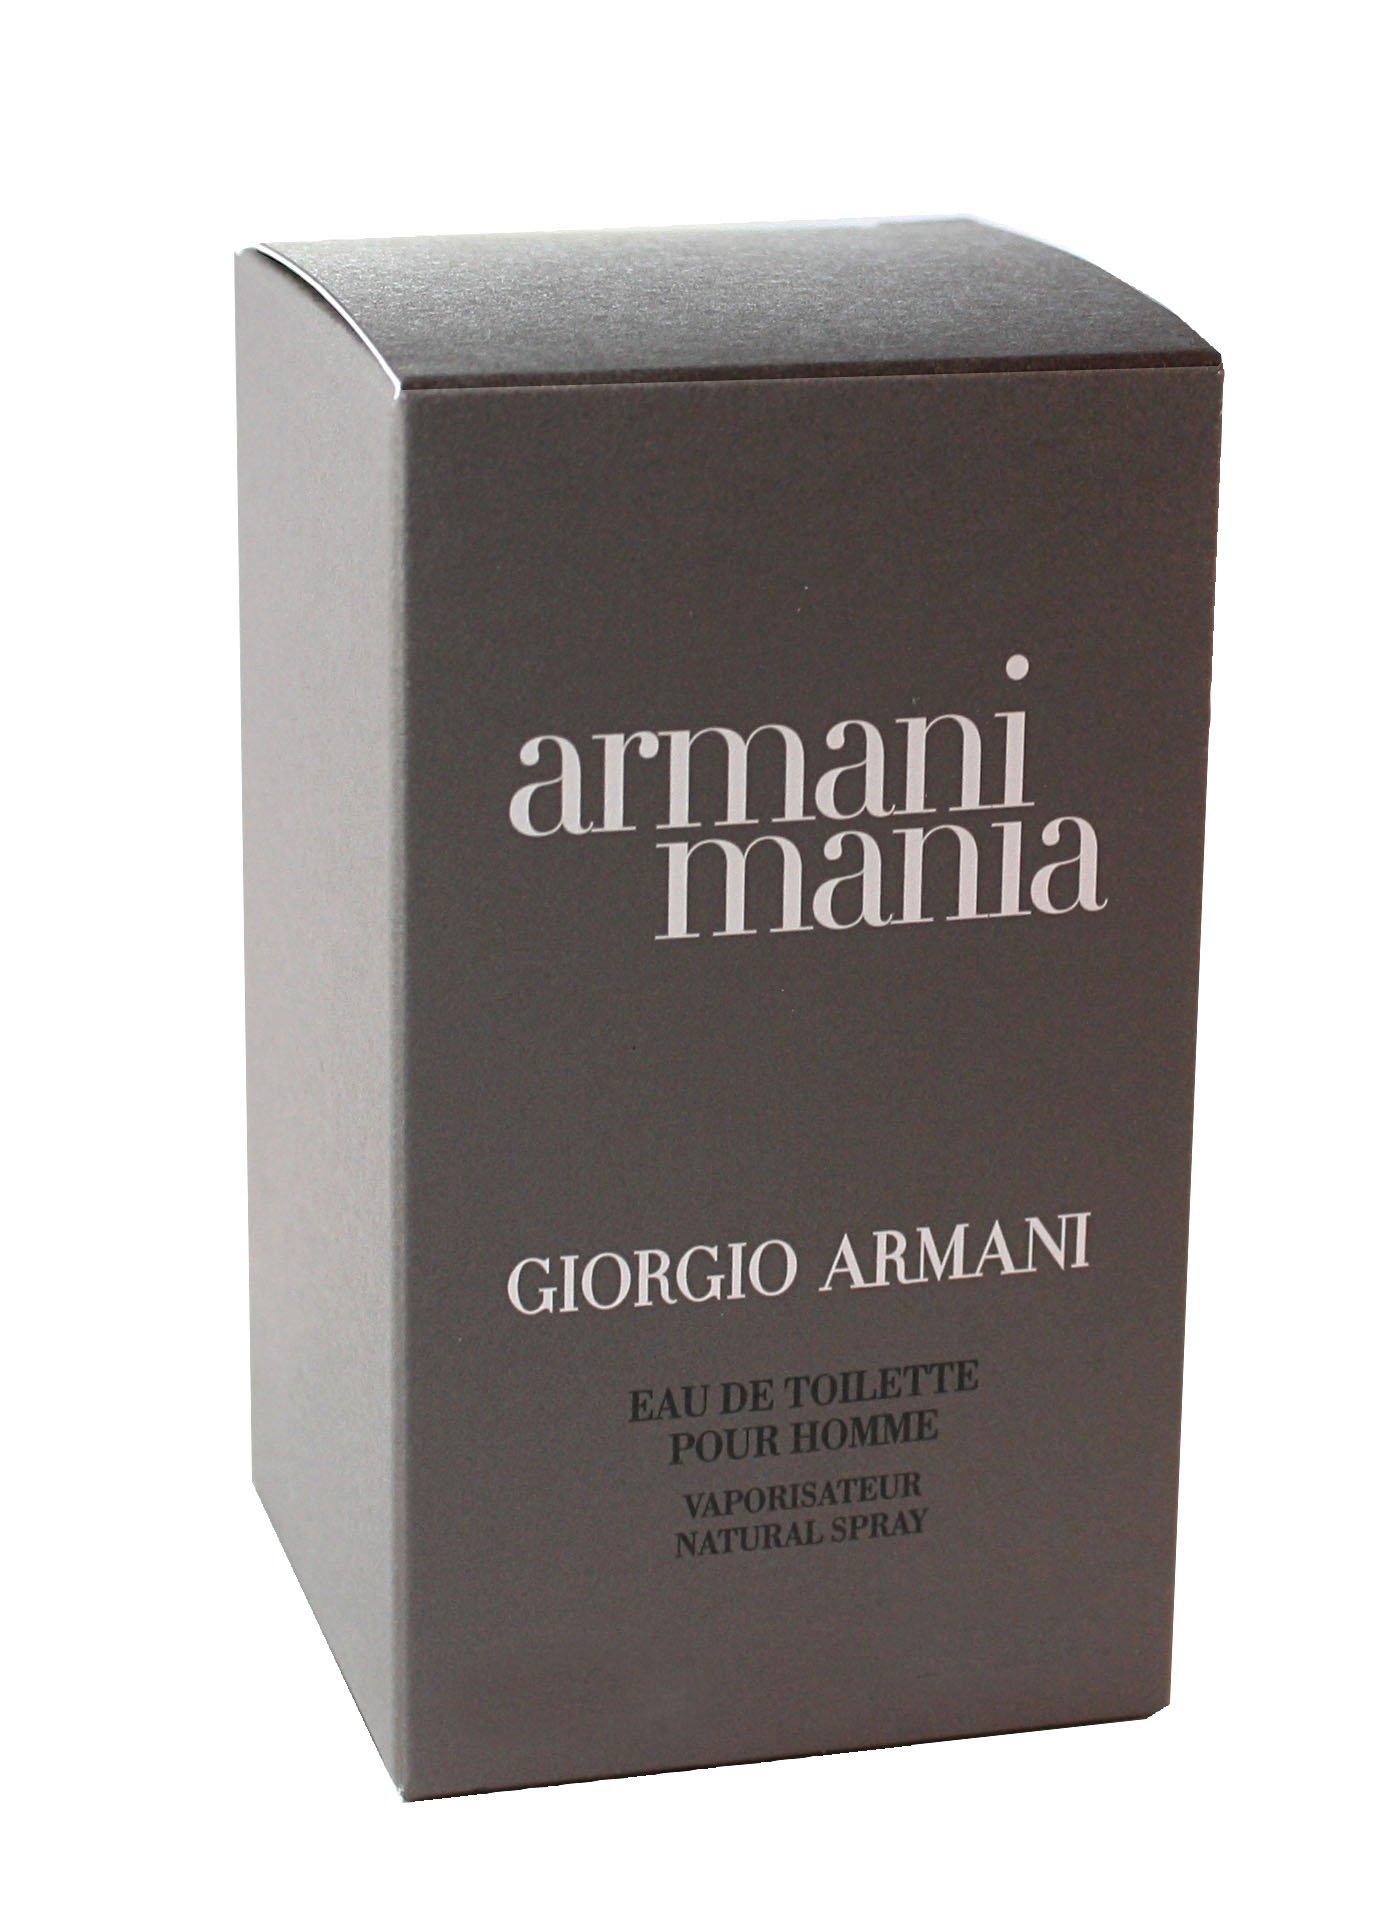 Mania By Giorgio Armani For Men. Eau De Toilette Spray 3.4 Ounces